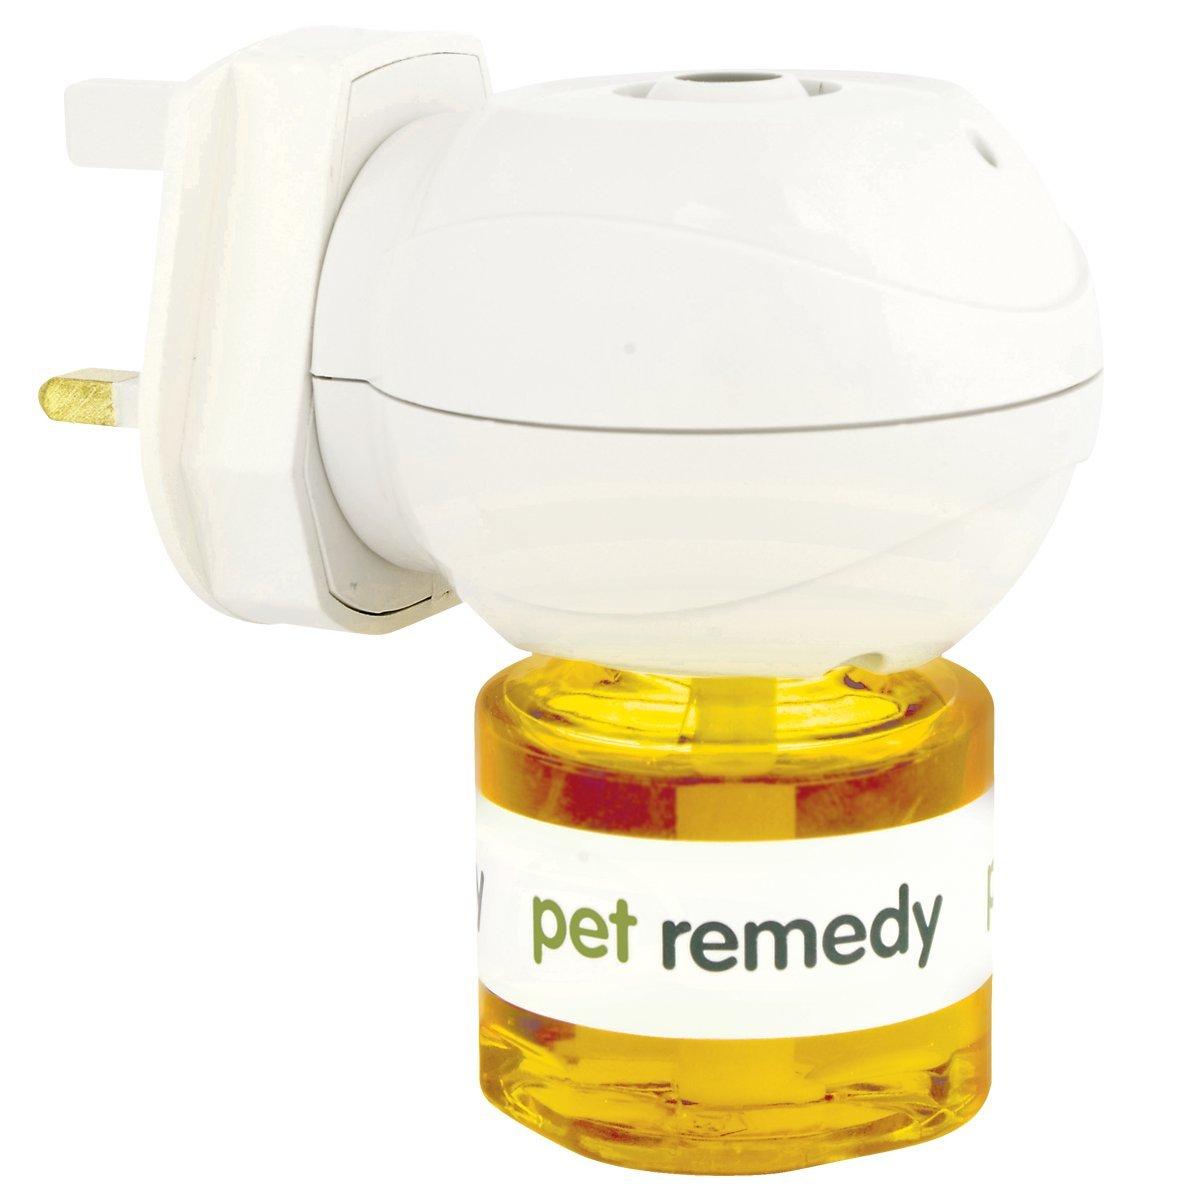 Dog Rocks Pet Remedy Diffuser